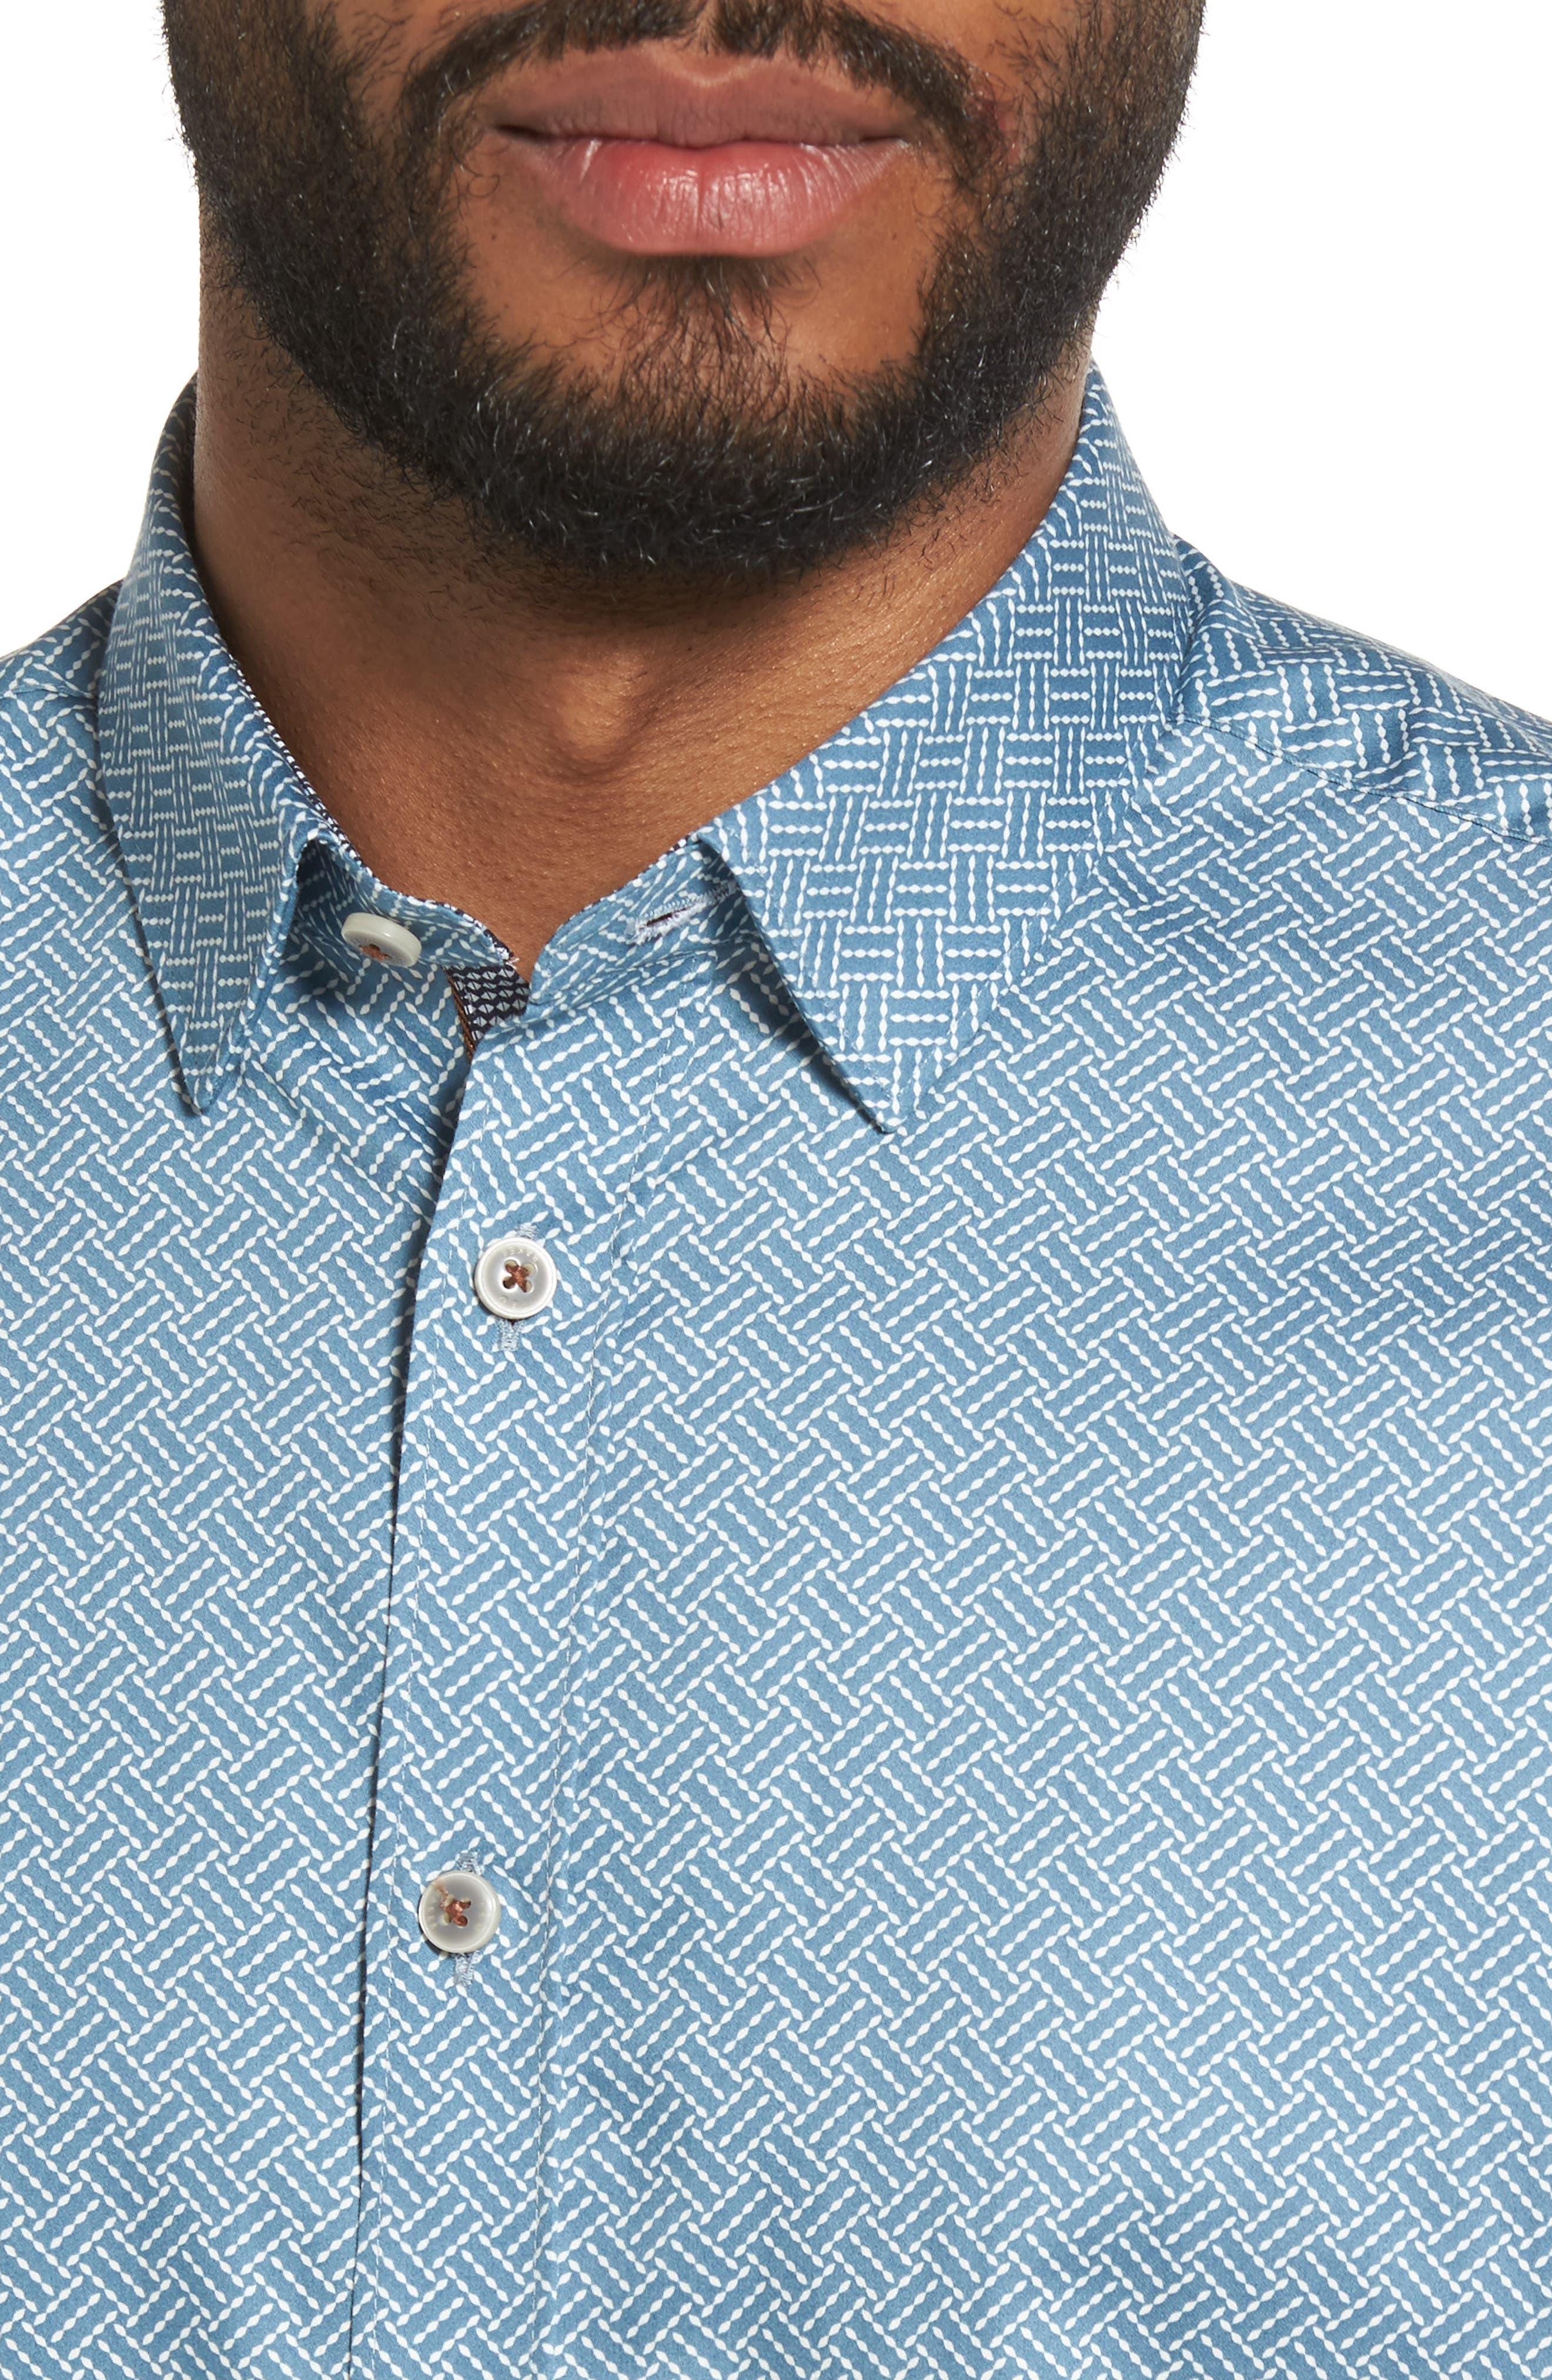 Lashore Basketweave Print Woven Shirt,                             Alternate thumbnail 4, color,                             421